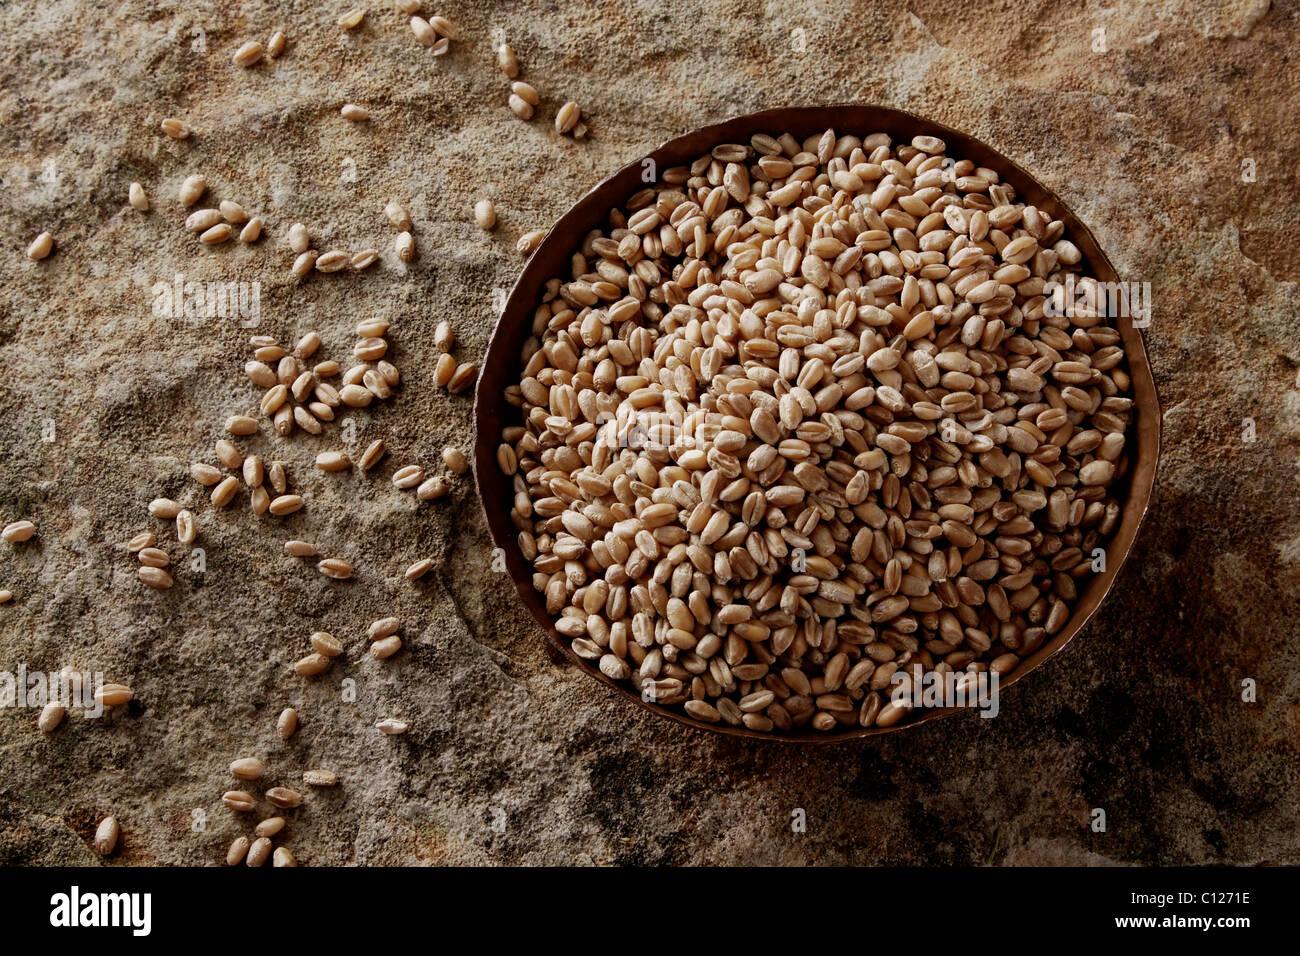 Chicchi di grano (Triticum) in un recipiente di rame su di una superficie di pietra Immagini Stock